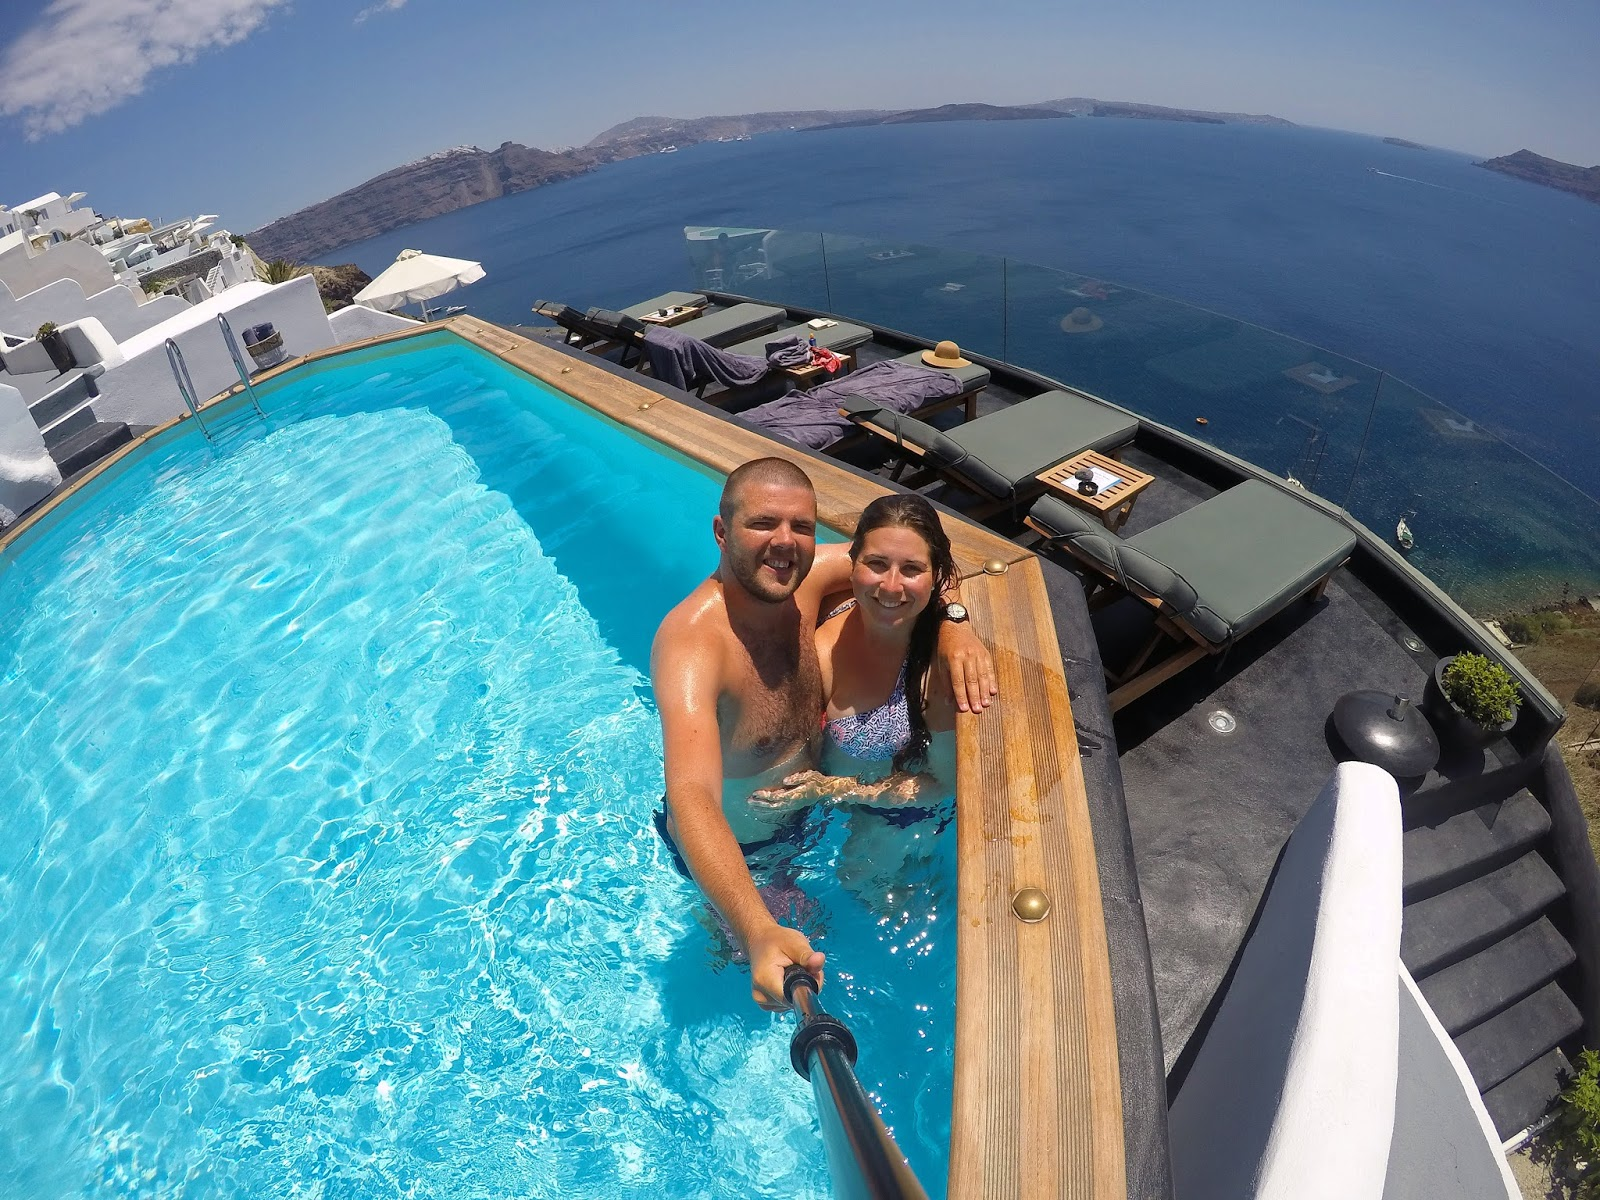 Couple in swimming pool at Nostos Apartments Oia Santorini